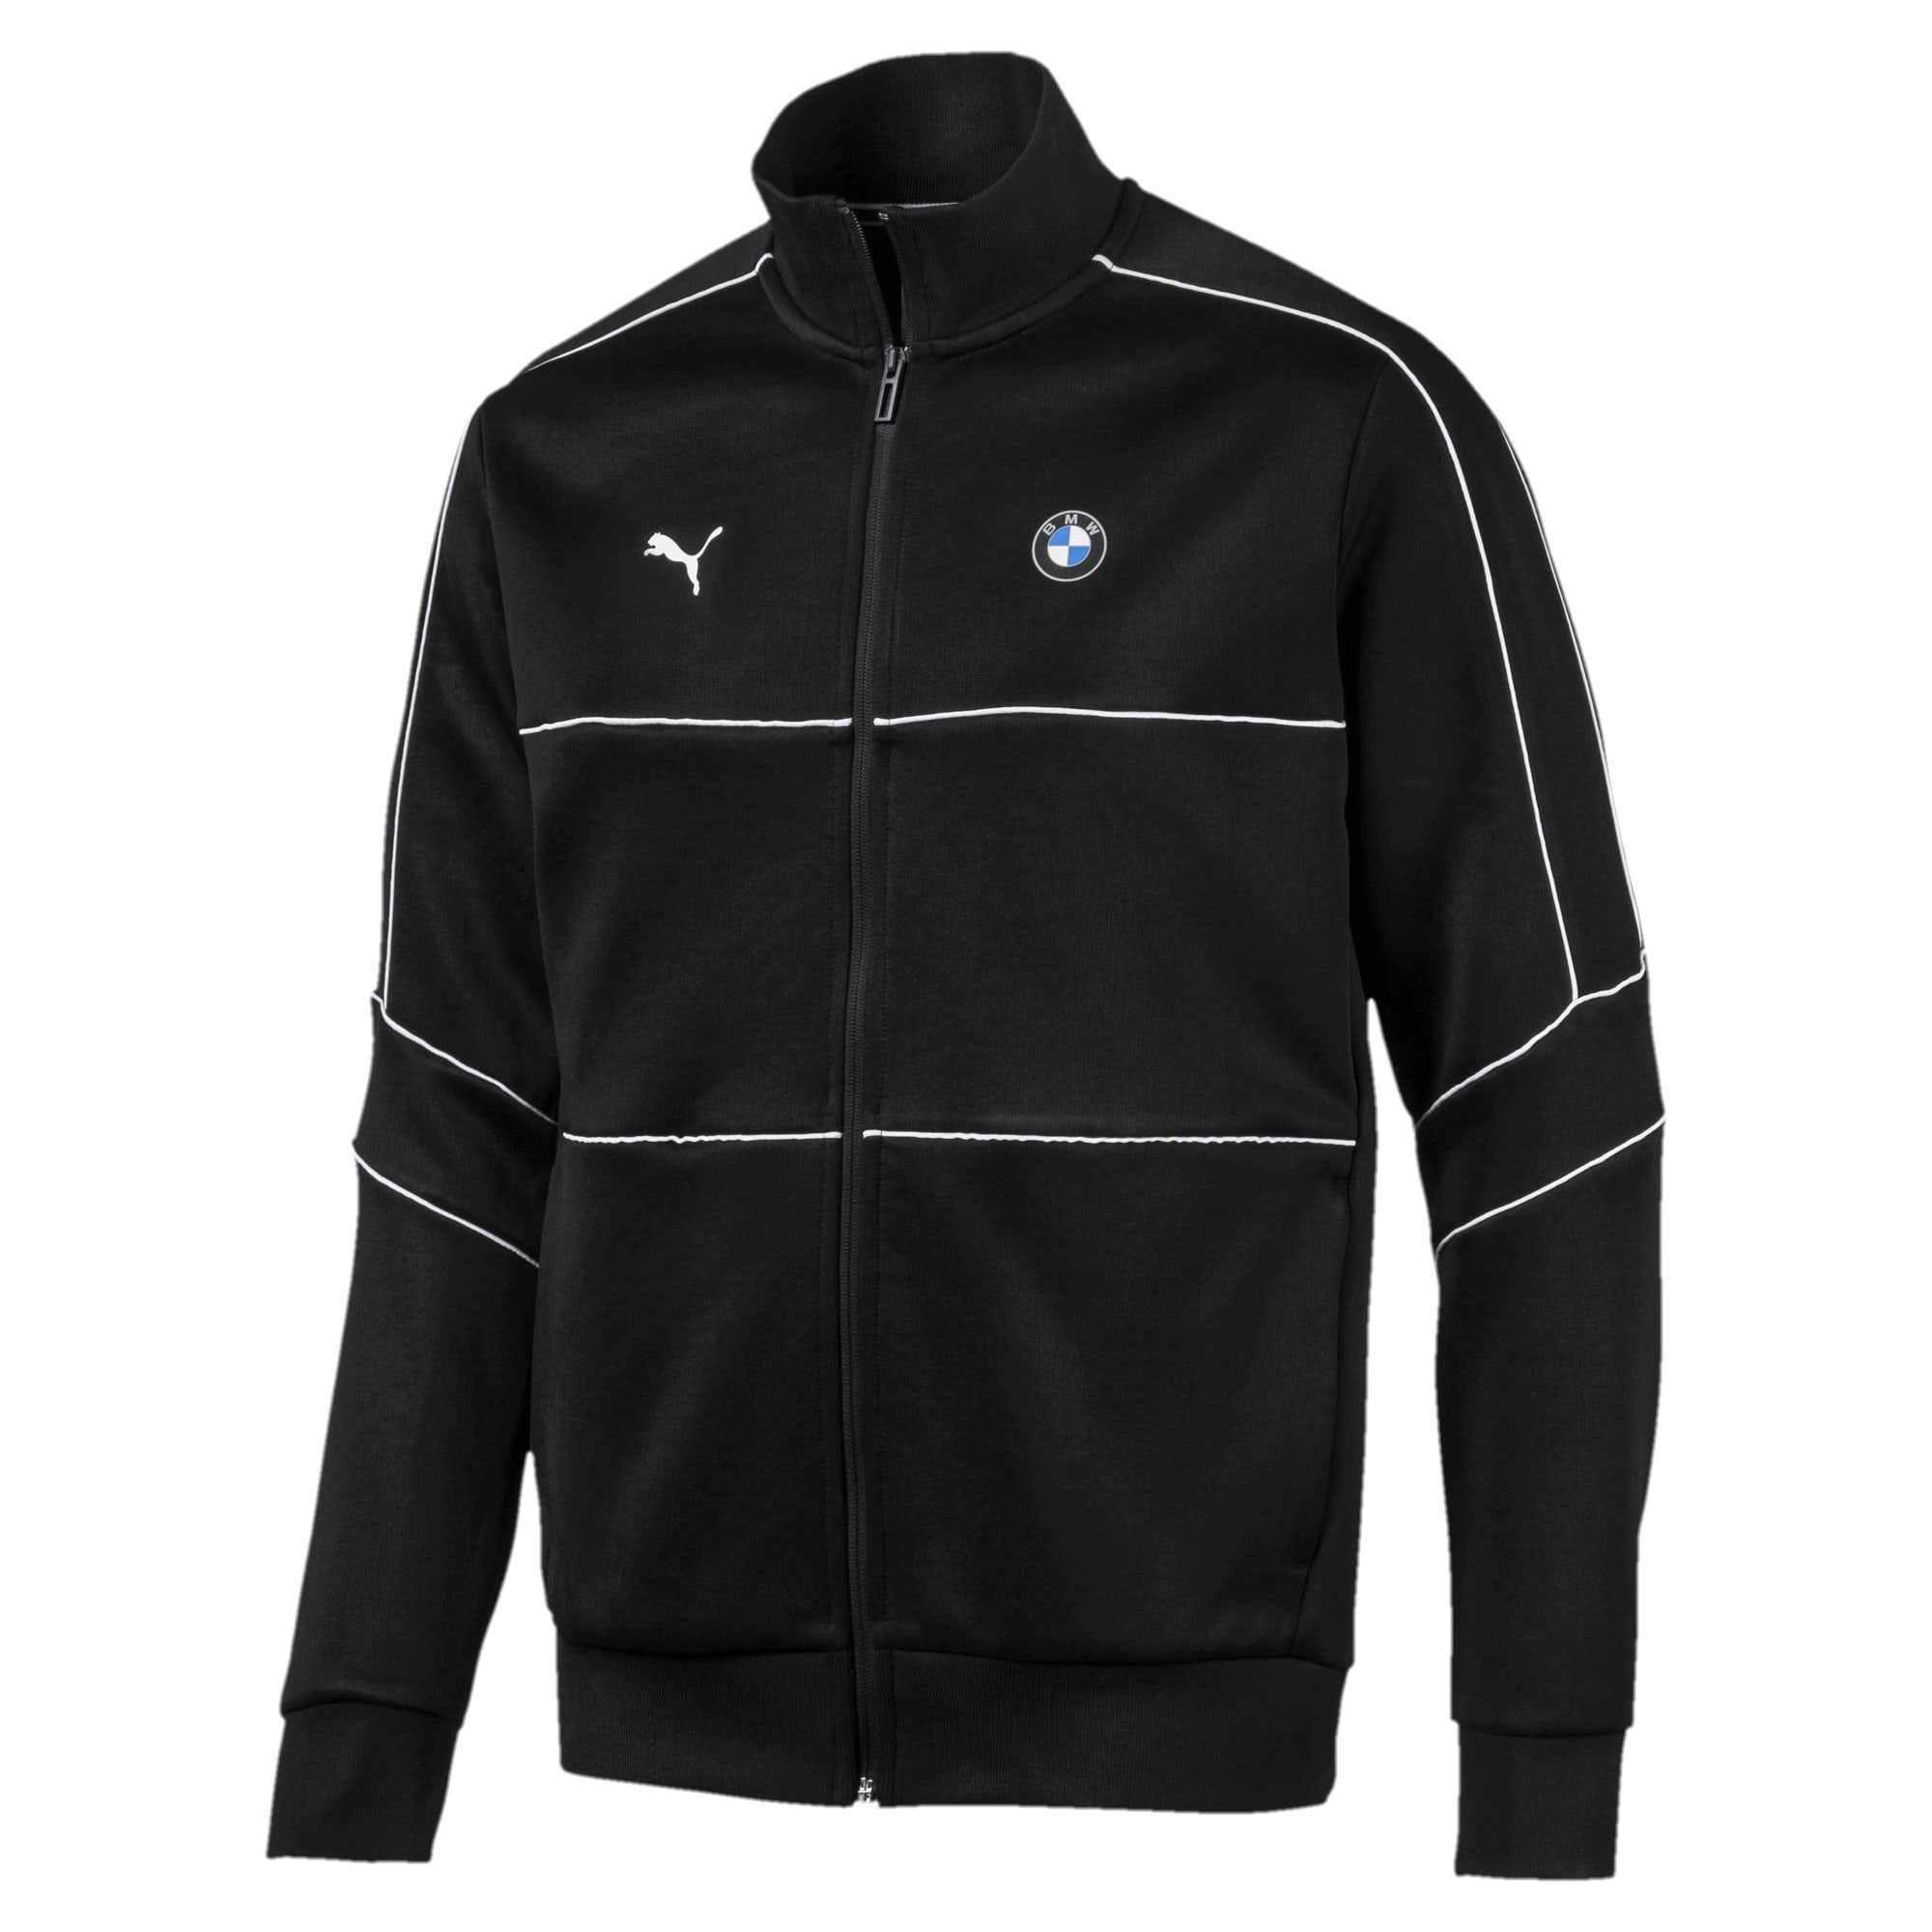 Thumbnail 1 of BMW M Motorsports T7 Track Men's Jacket, Puma Black, medium-IND